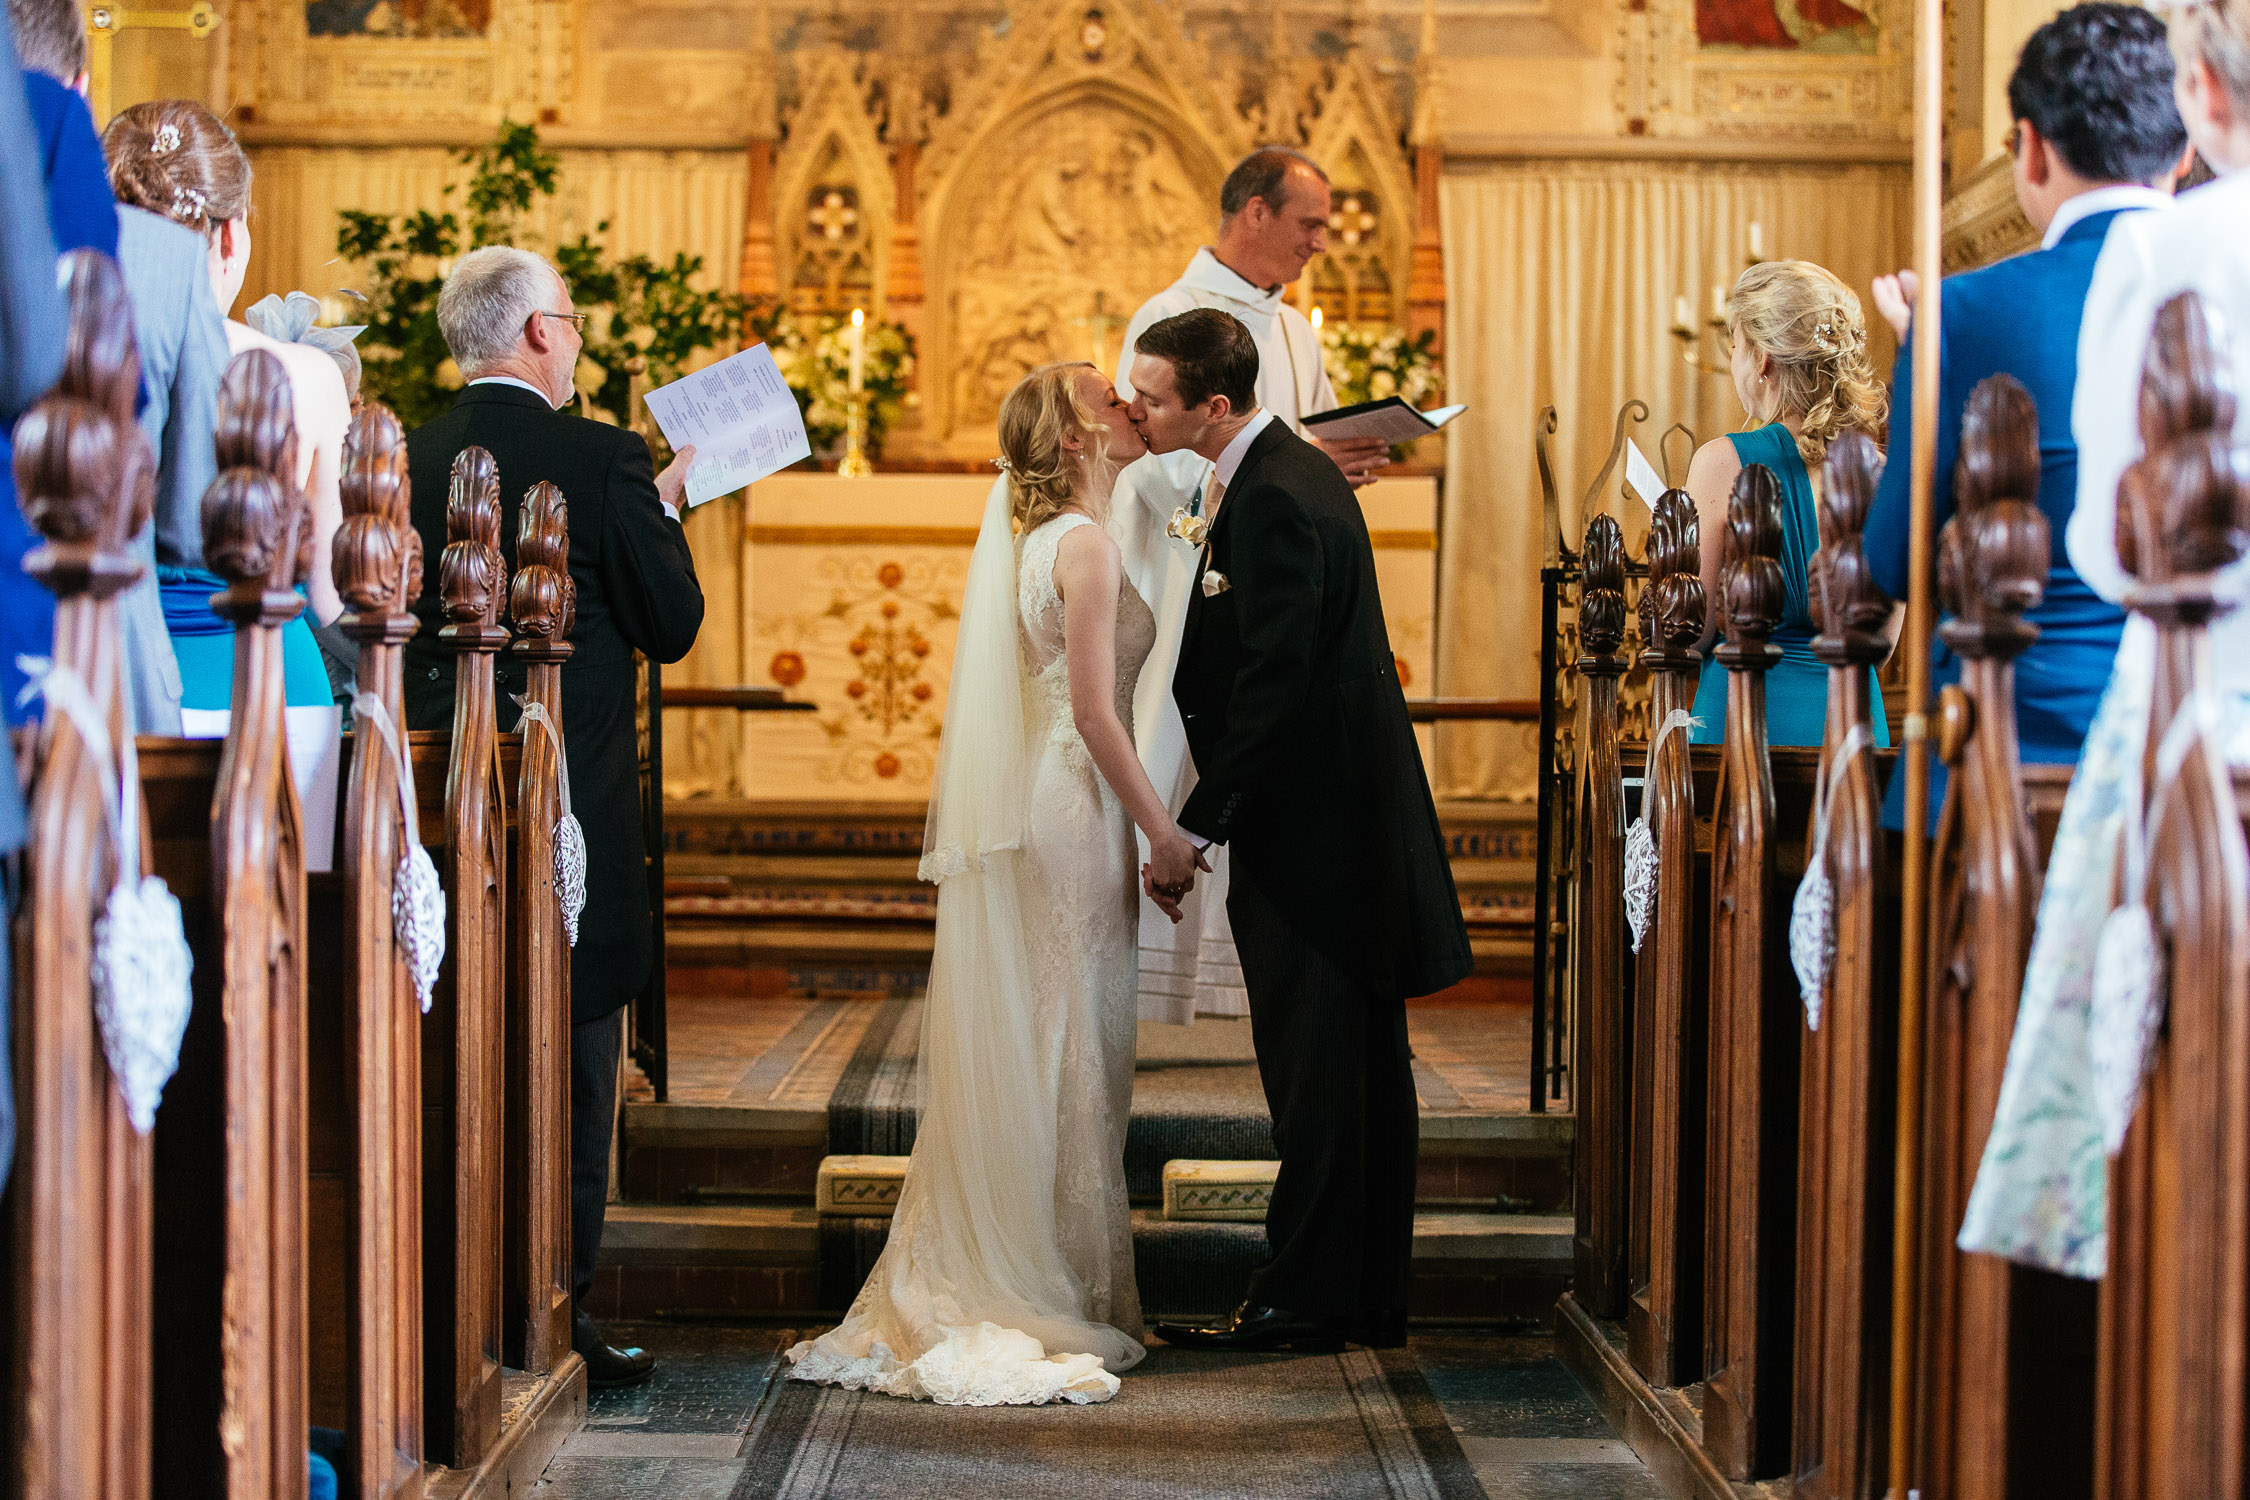 Lizi-and-Mark-Wedding-Highlights-31.jpg